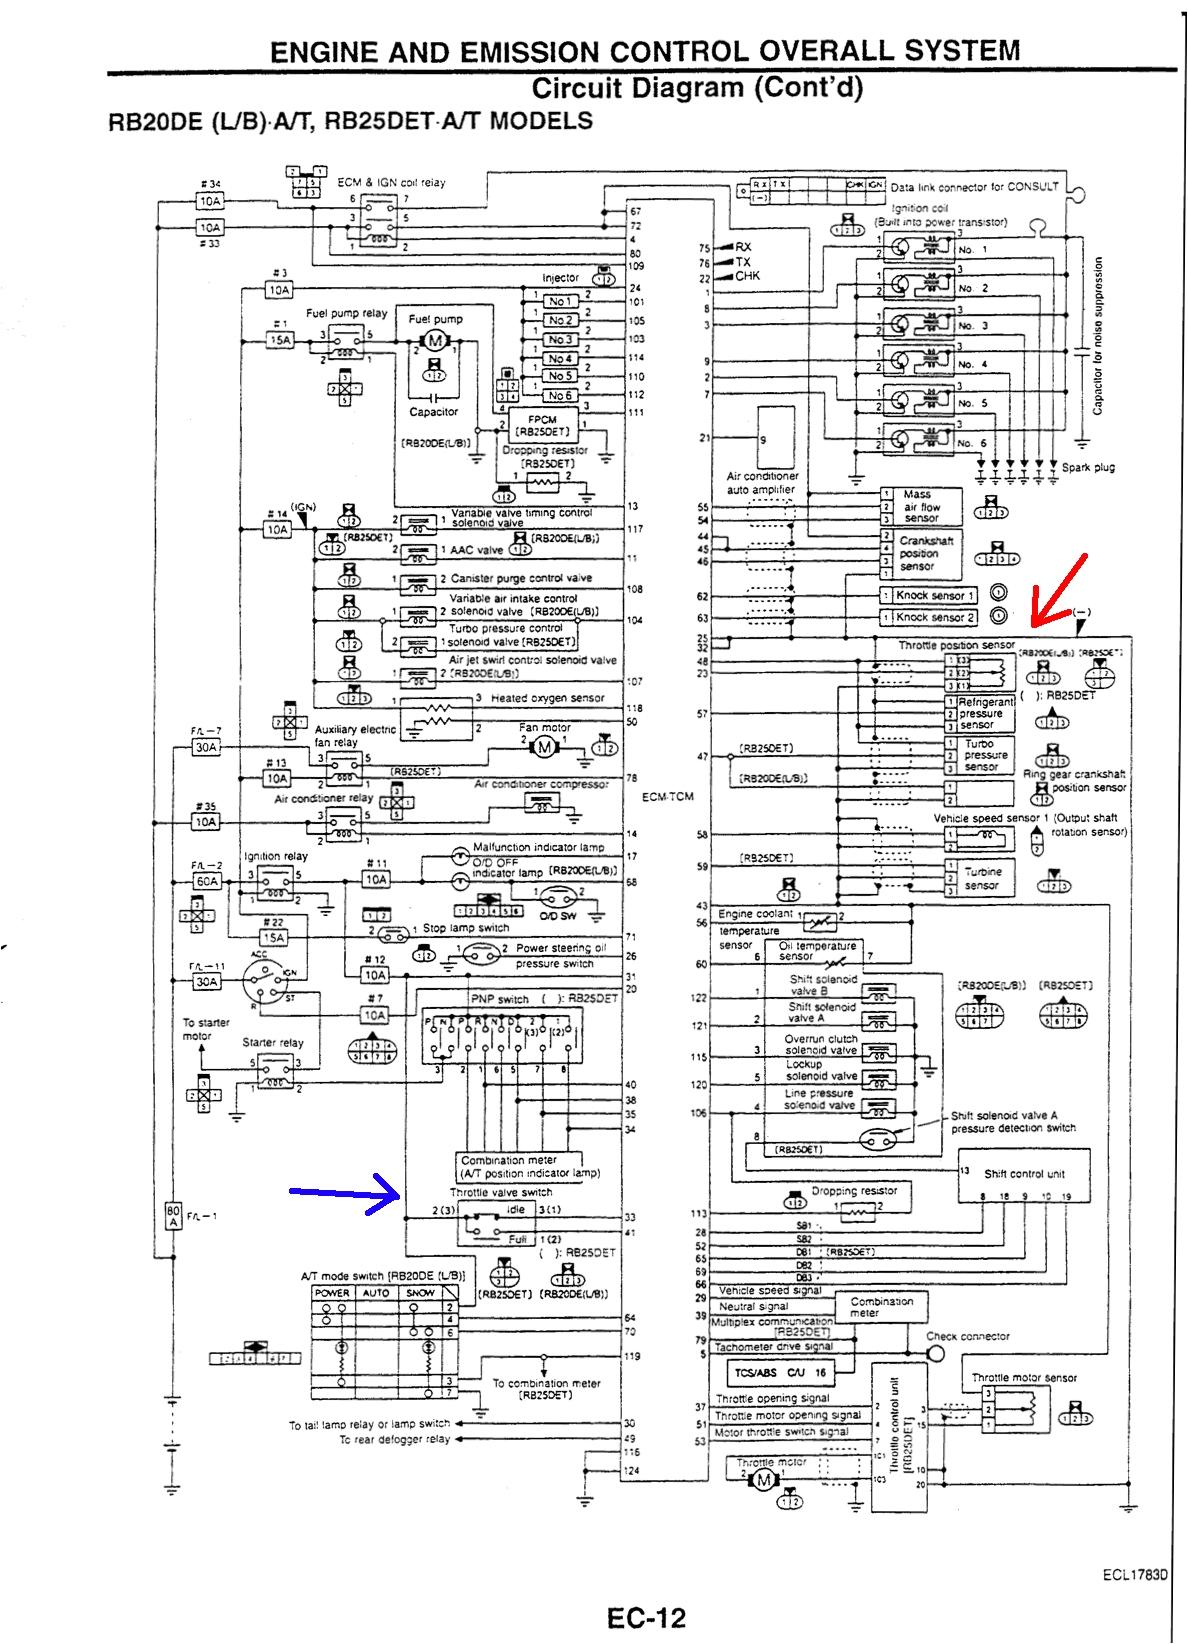 rb25 wiring diagram wiring diagram expertrb25det wiring diagram my wiring diagram rb25det s1 wiring diagram rb25